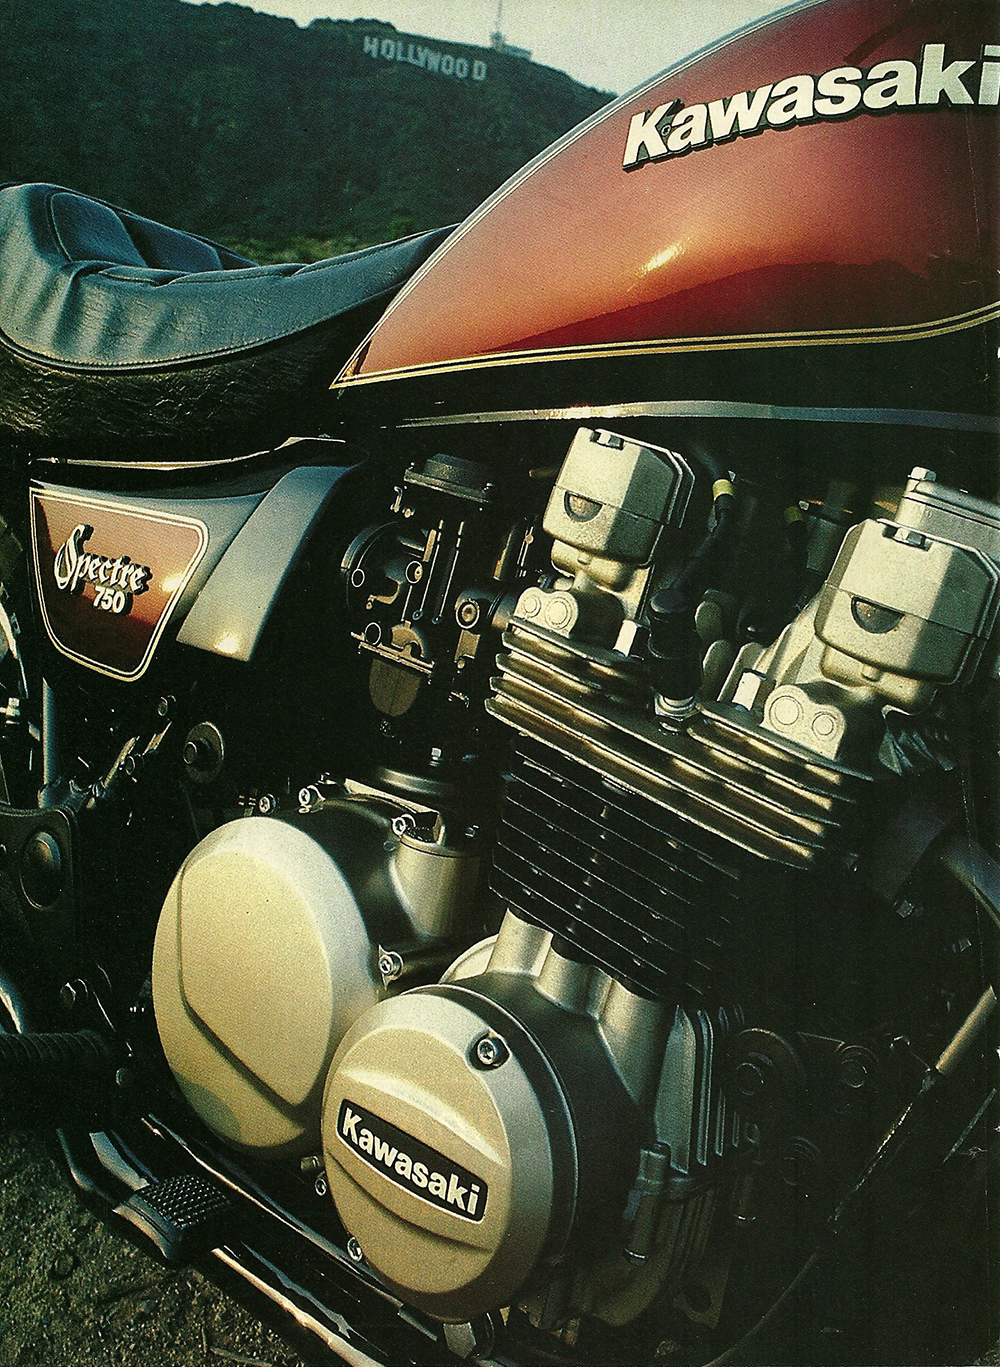 1982 Kawasaki KZ750N Spectre road test 1.jpg